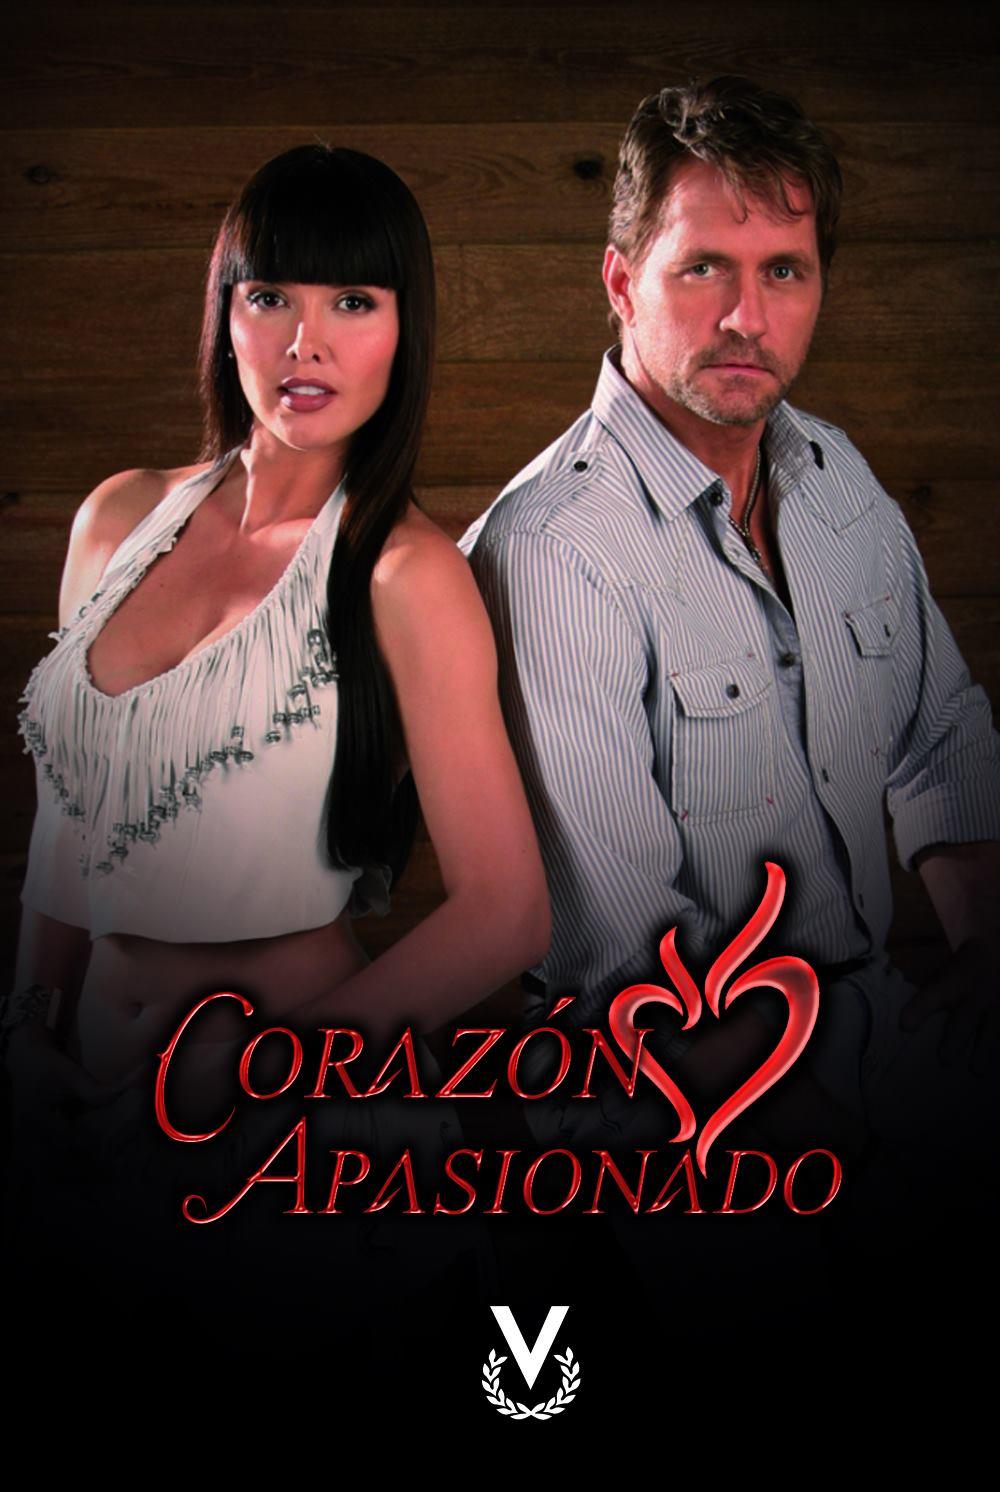 """Corazón Apasionado"" (Univision - Venevision, 2011) 256caf075d25a38f0cc6caa3ca8836eb"